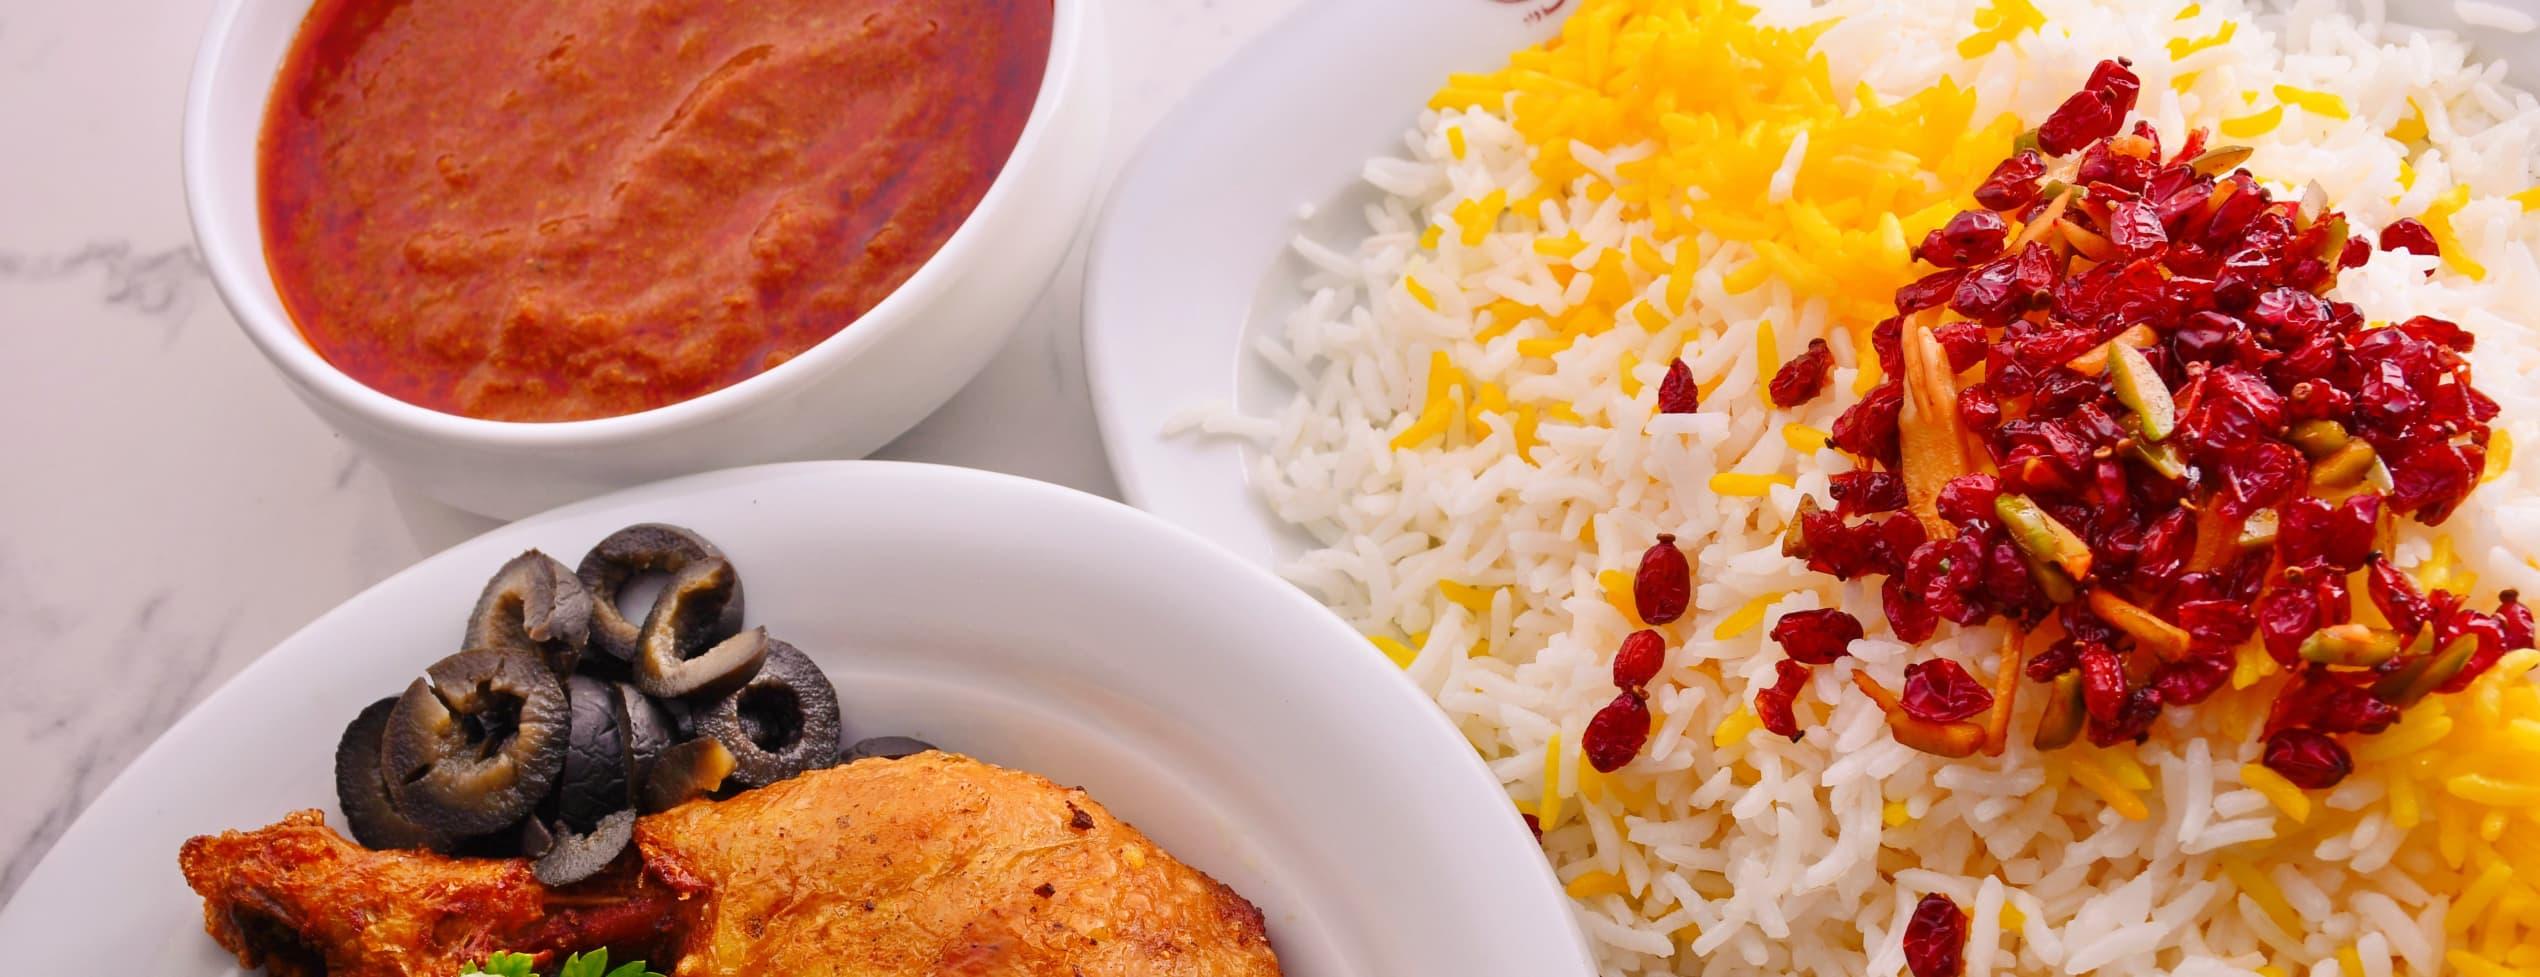 Persisk matlagning